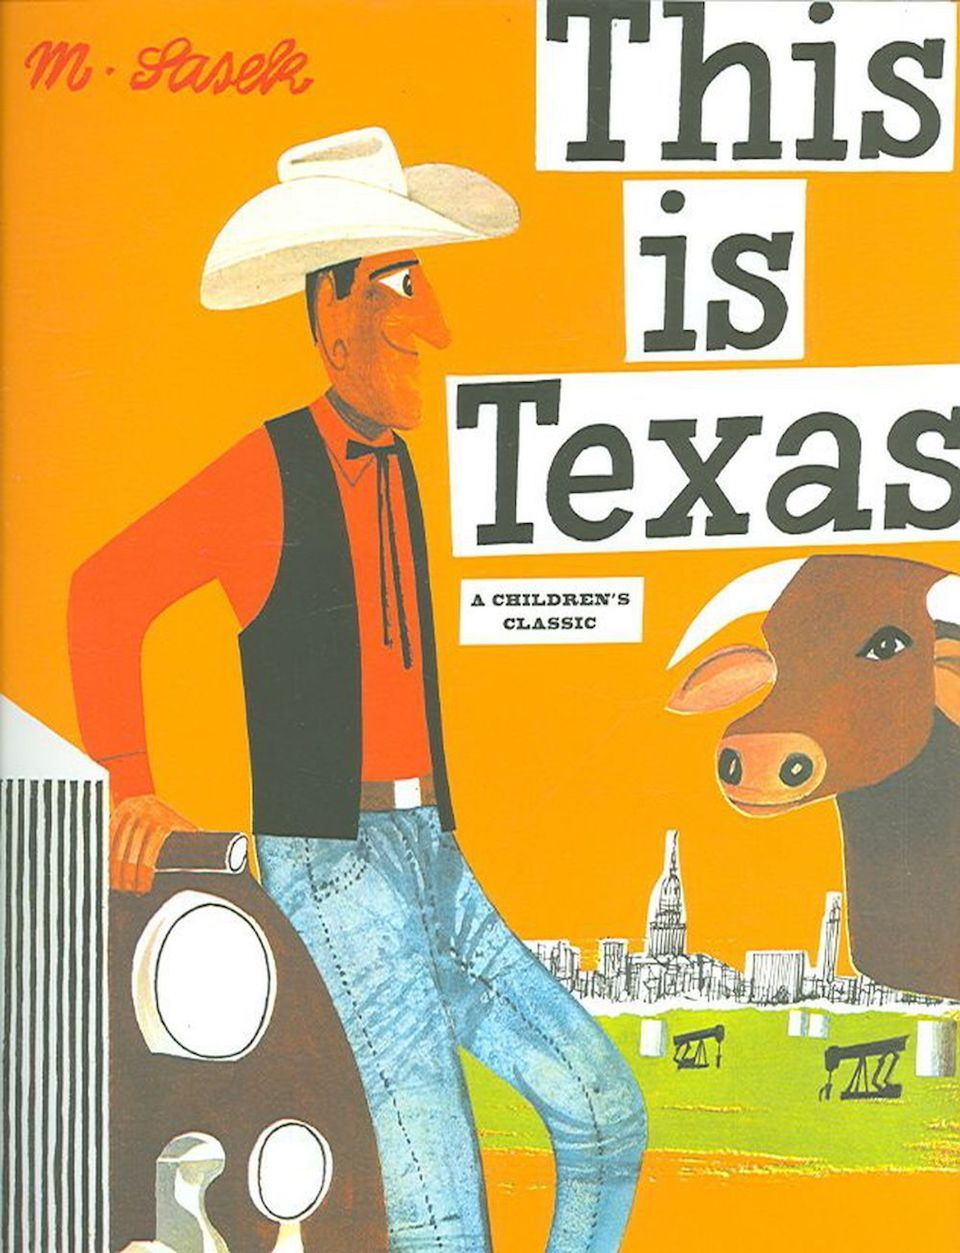 7 Children's Books about Dallas and Texas